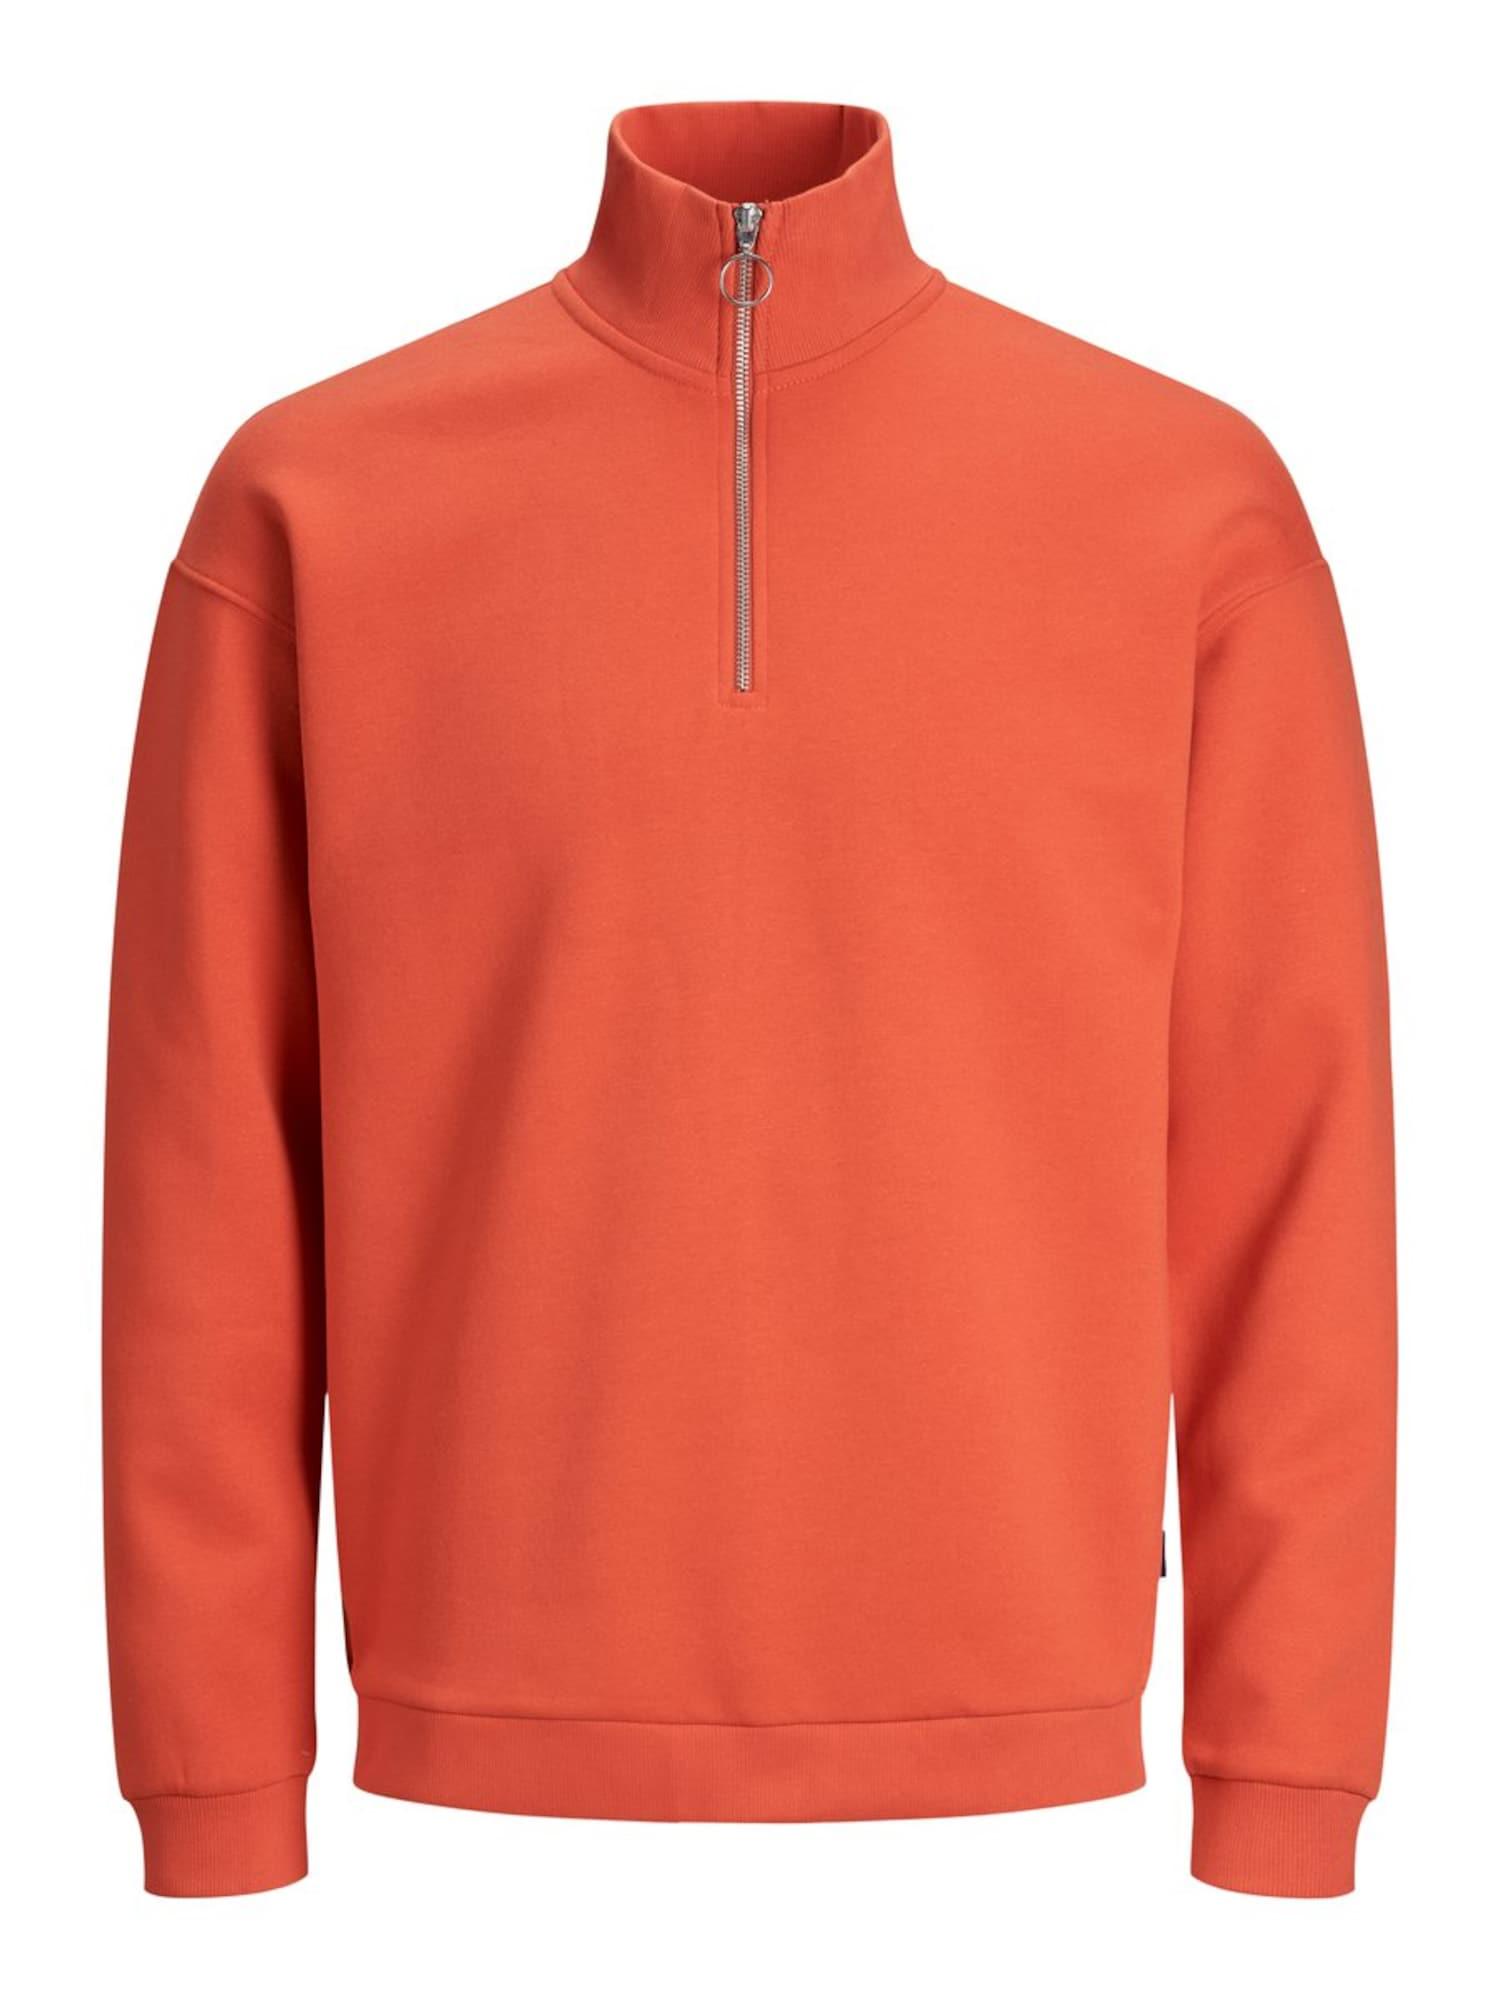 JACK & JONES Mikina  oranžovo červená